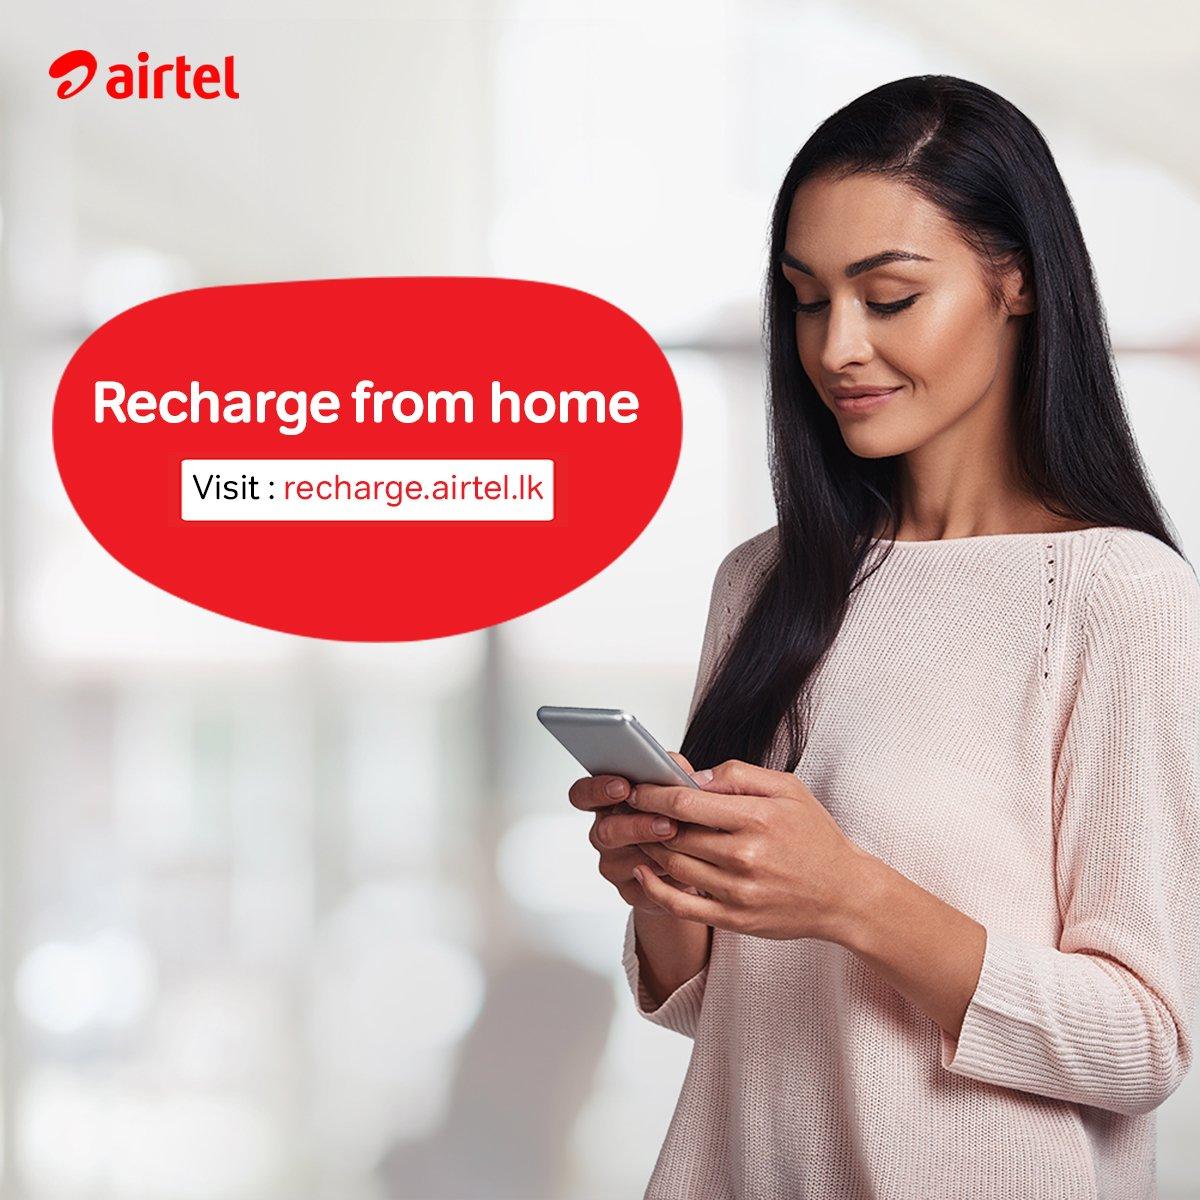 Now you can reload your Airtel connection using your bank credit or debit card. Visit https://t.co/t53fdVuGrR 😎 https://t.co/NTdD5li2Ek